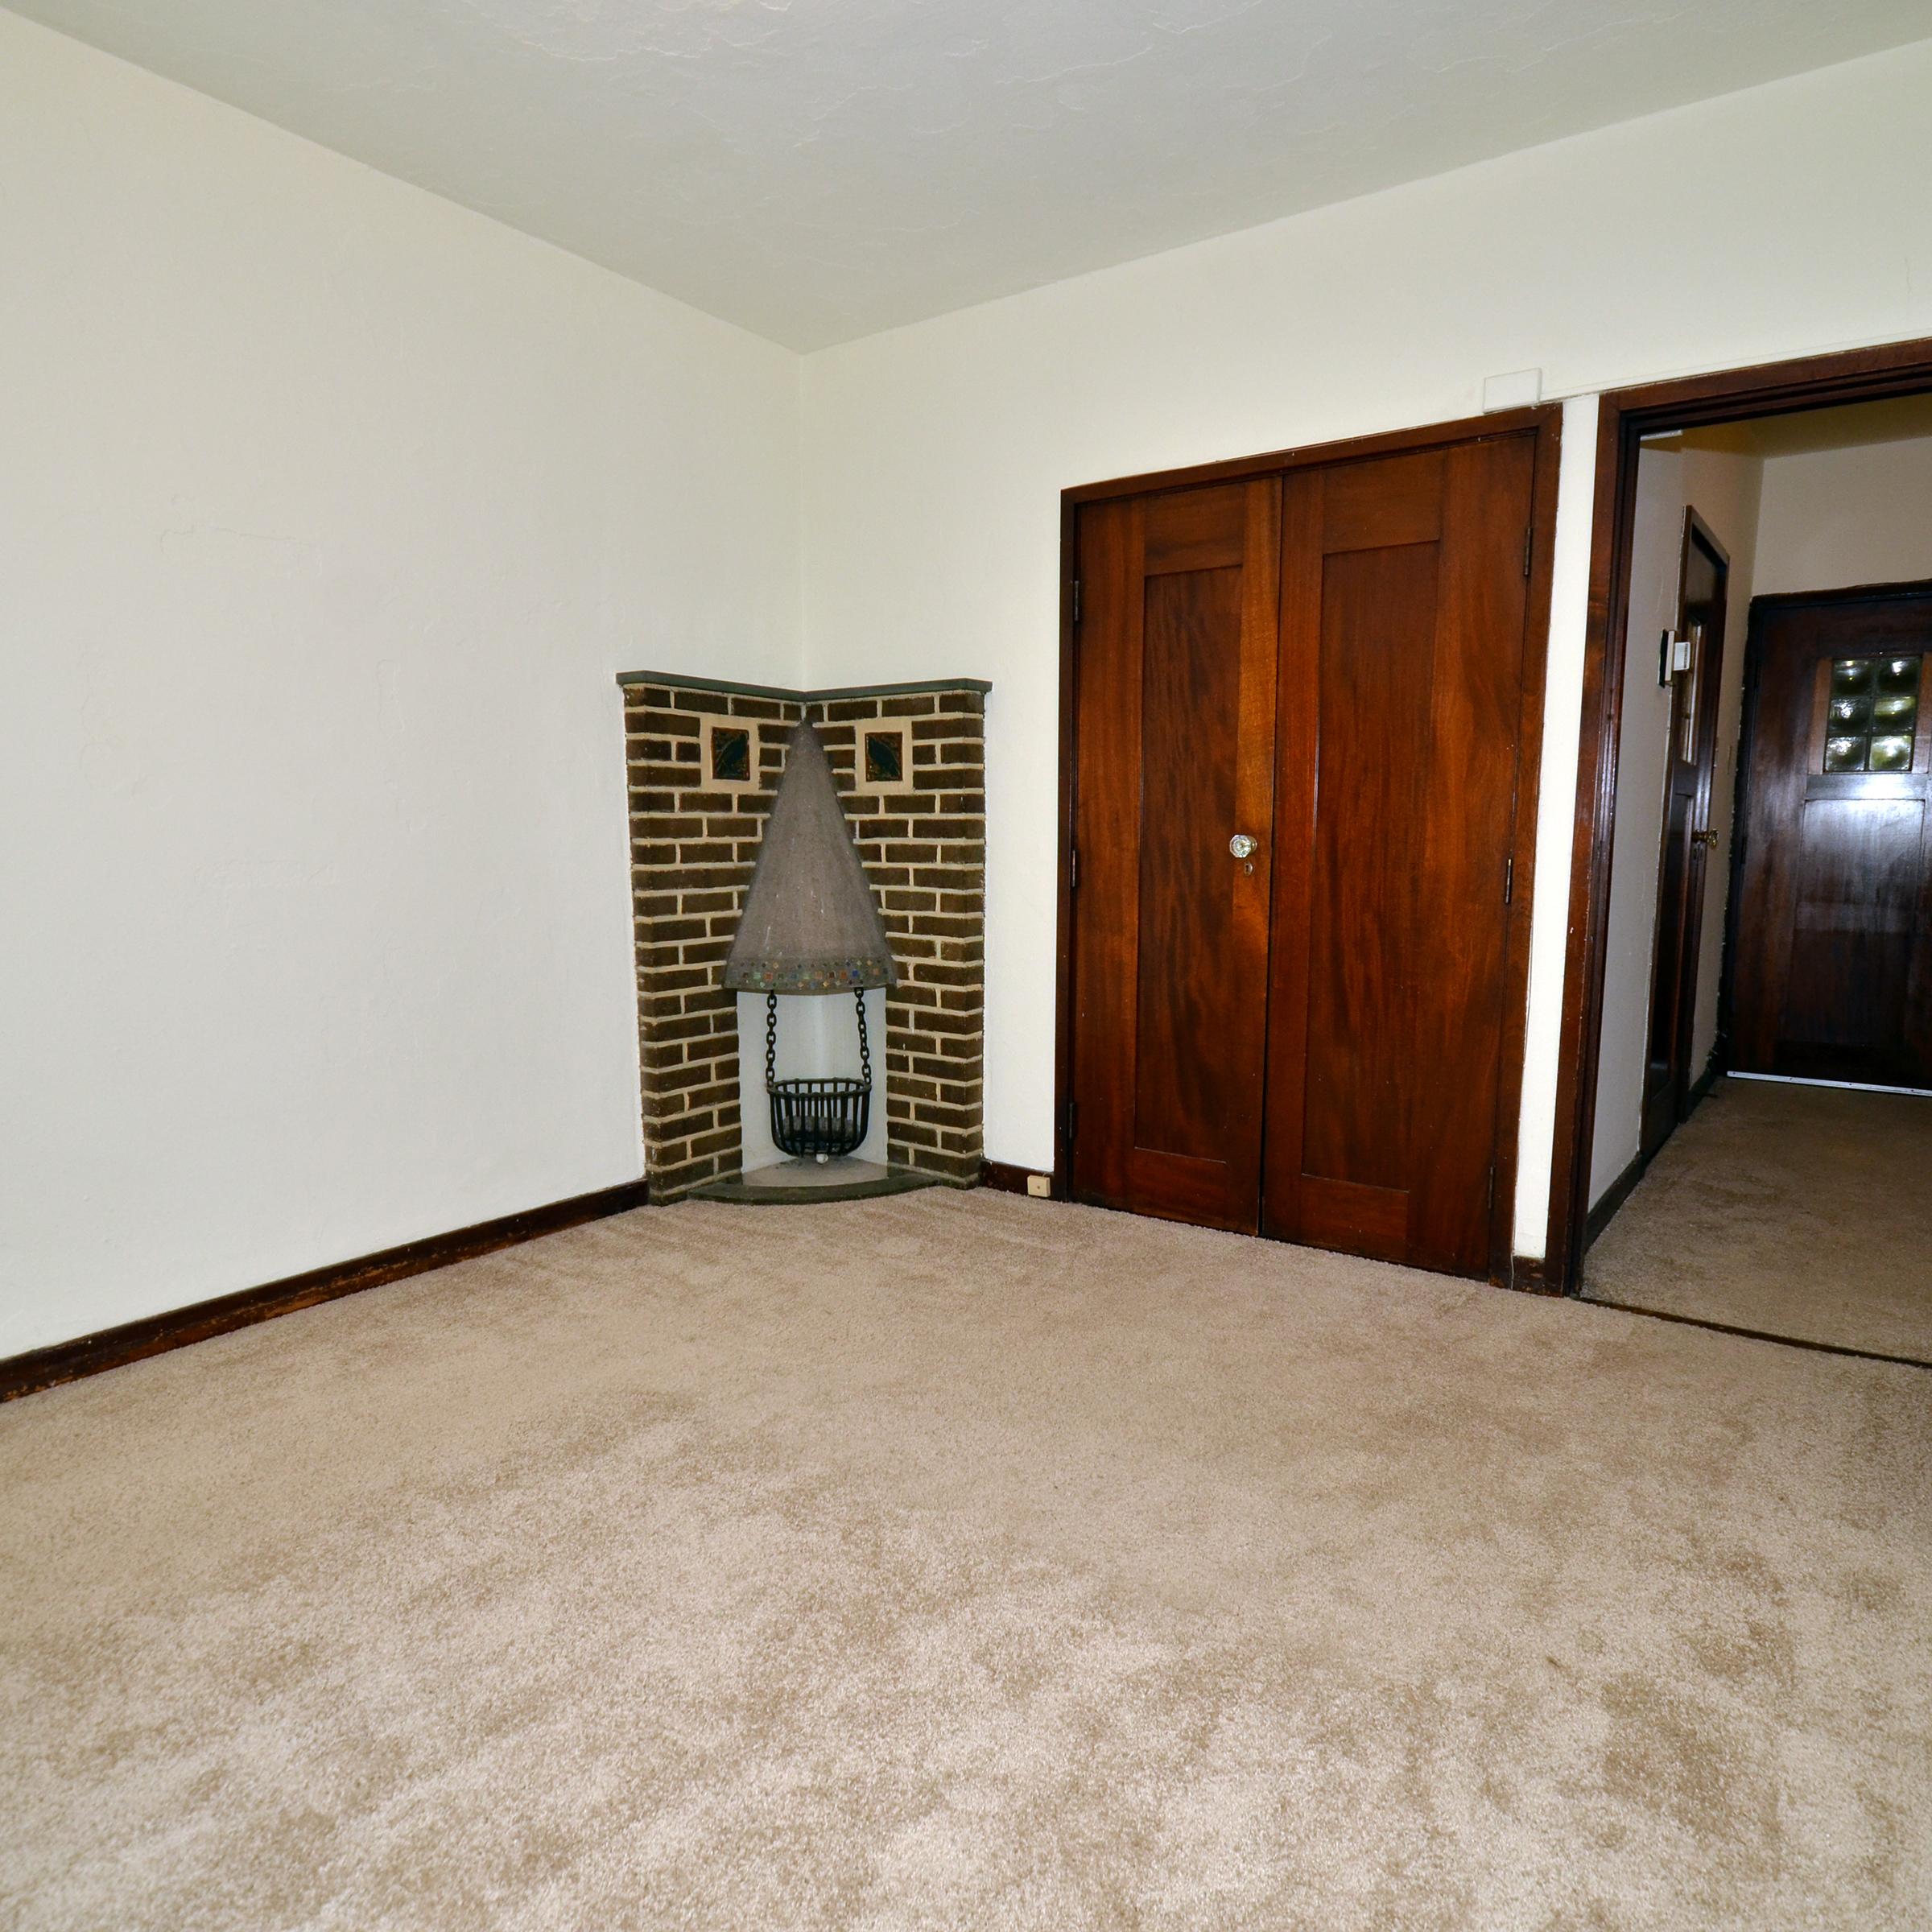 interior of 342 S. Highland Ave, Apt.  9B 1